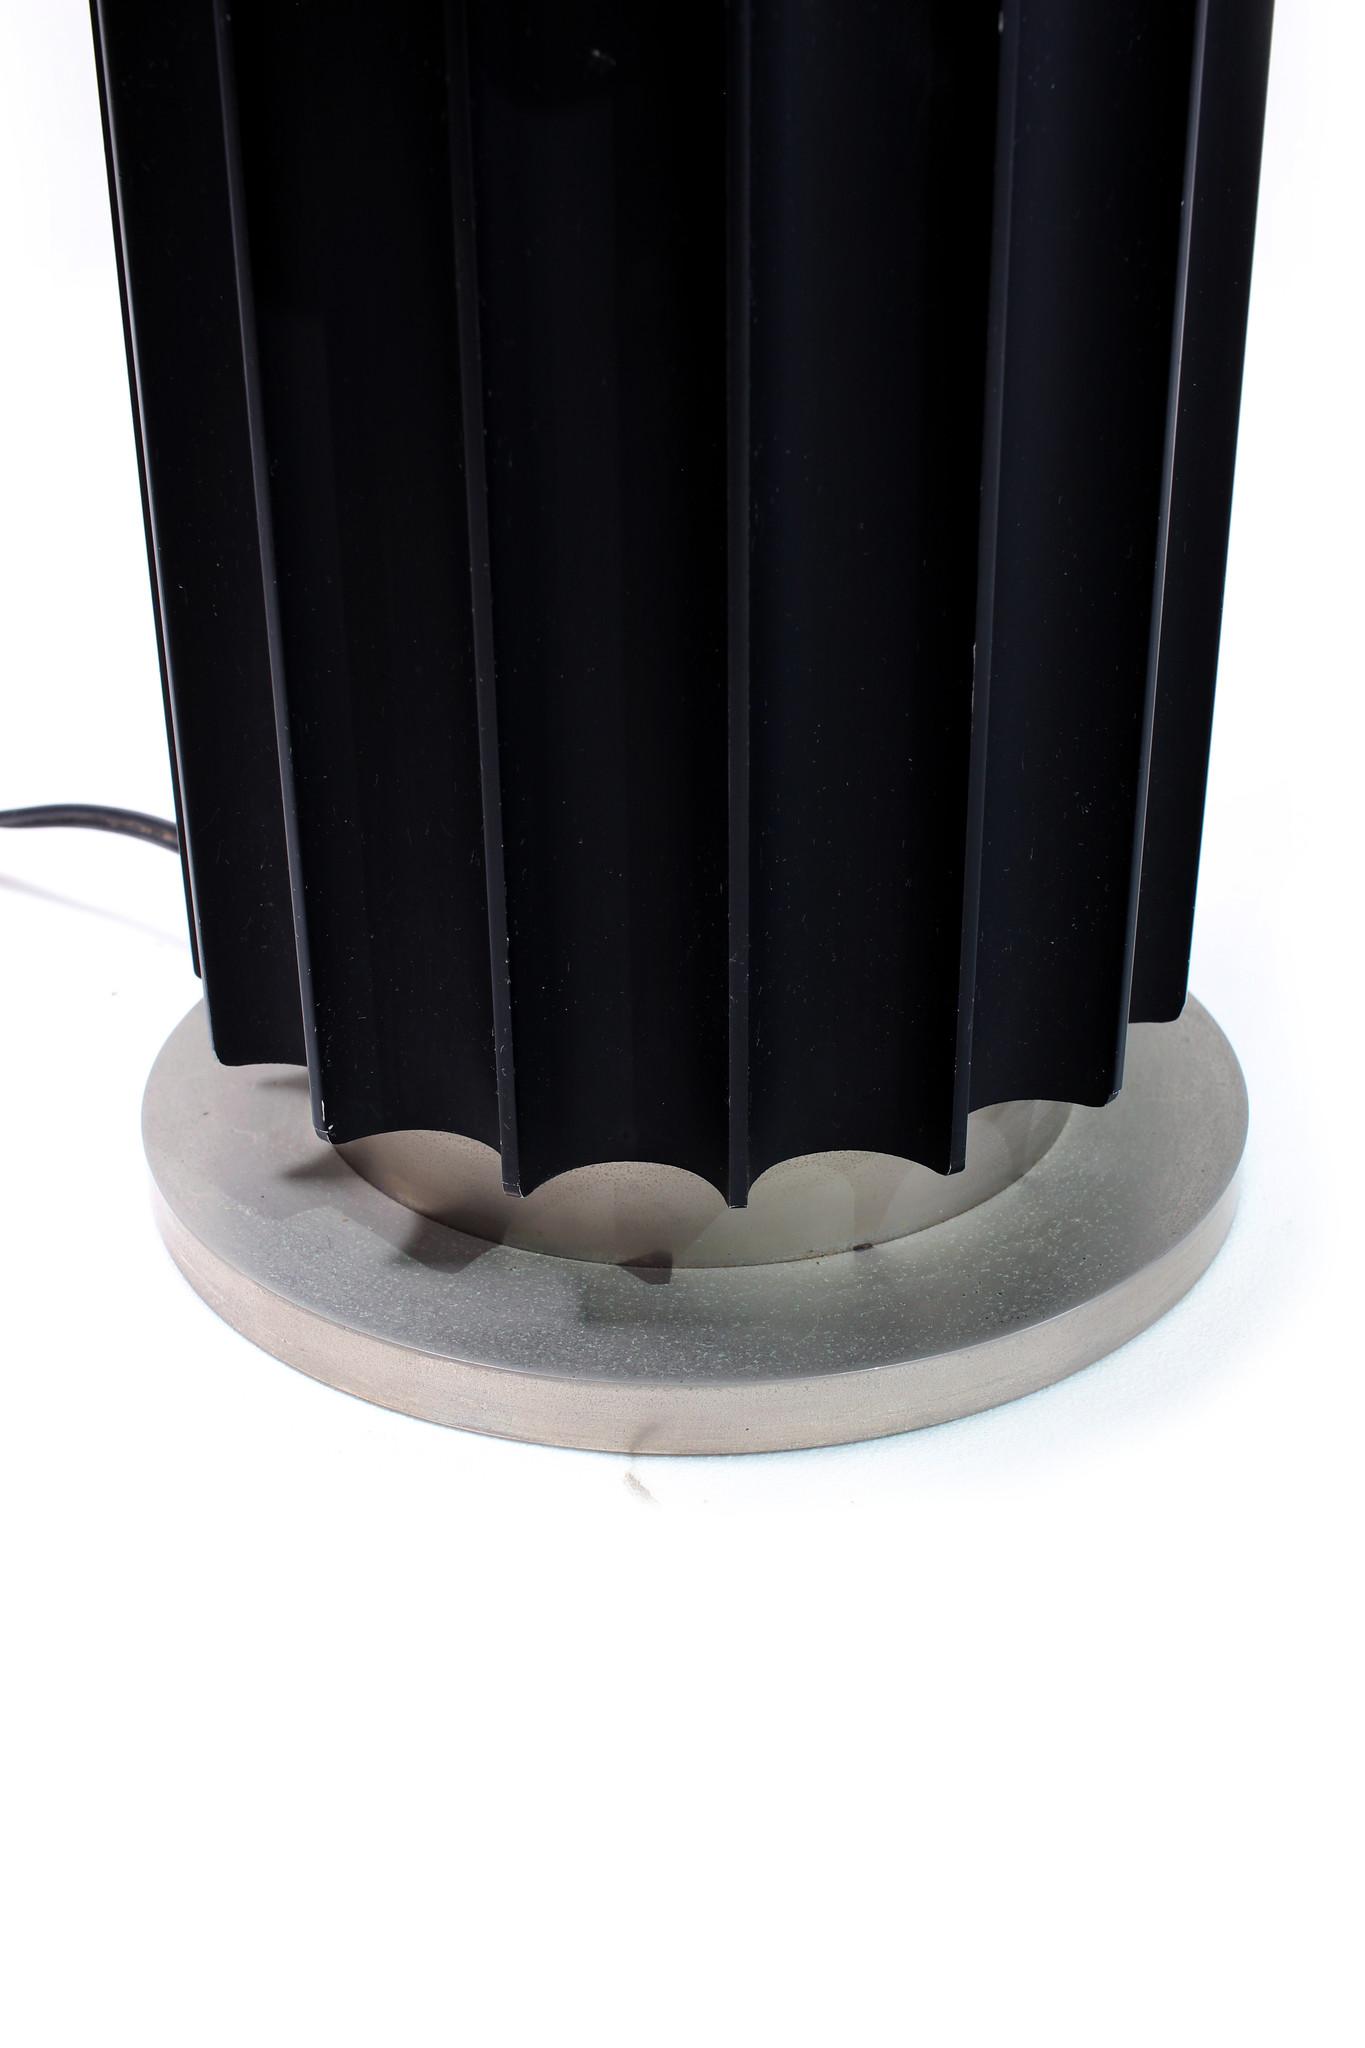 Vintage Flos taccia lamp, 1962